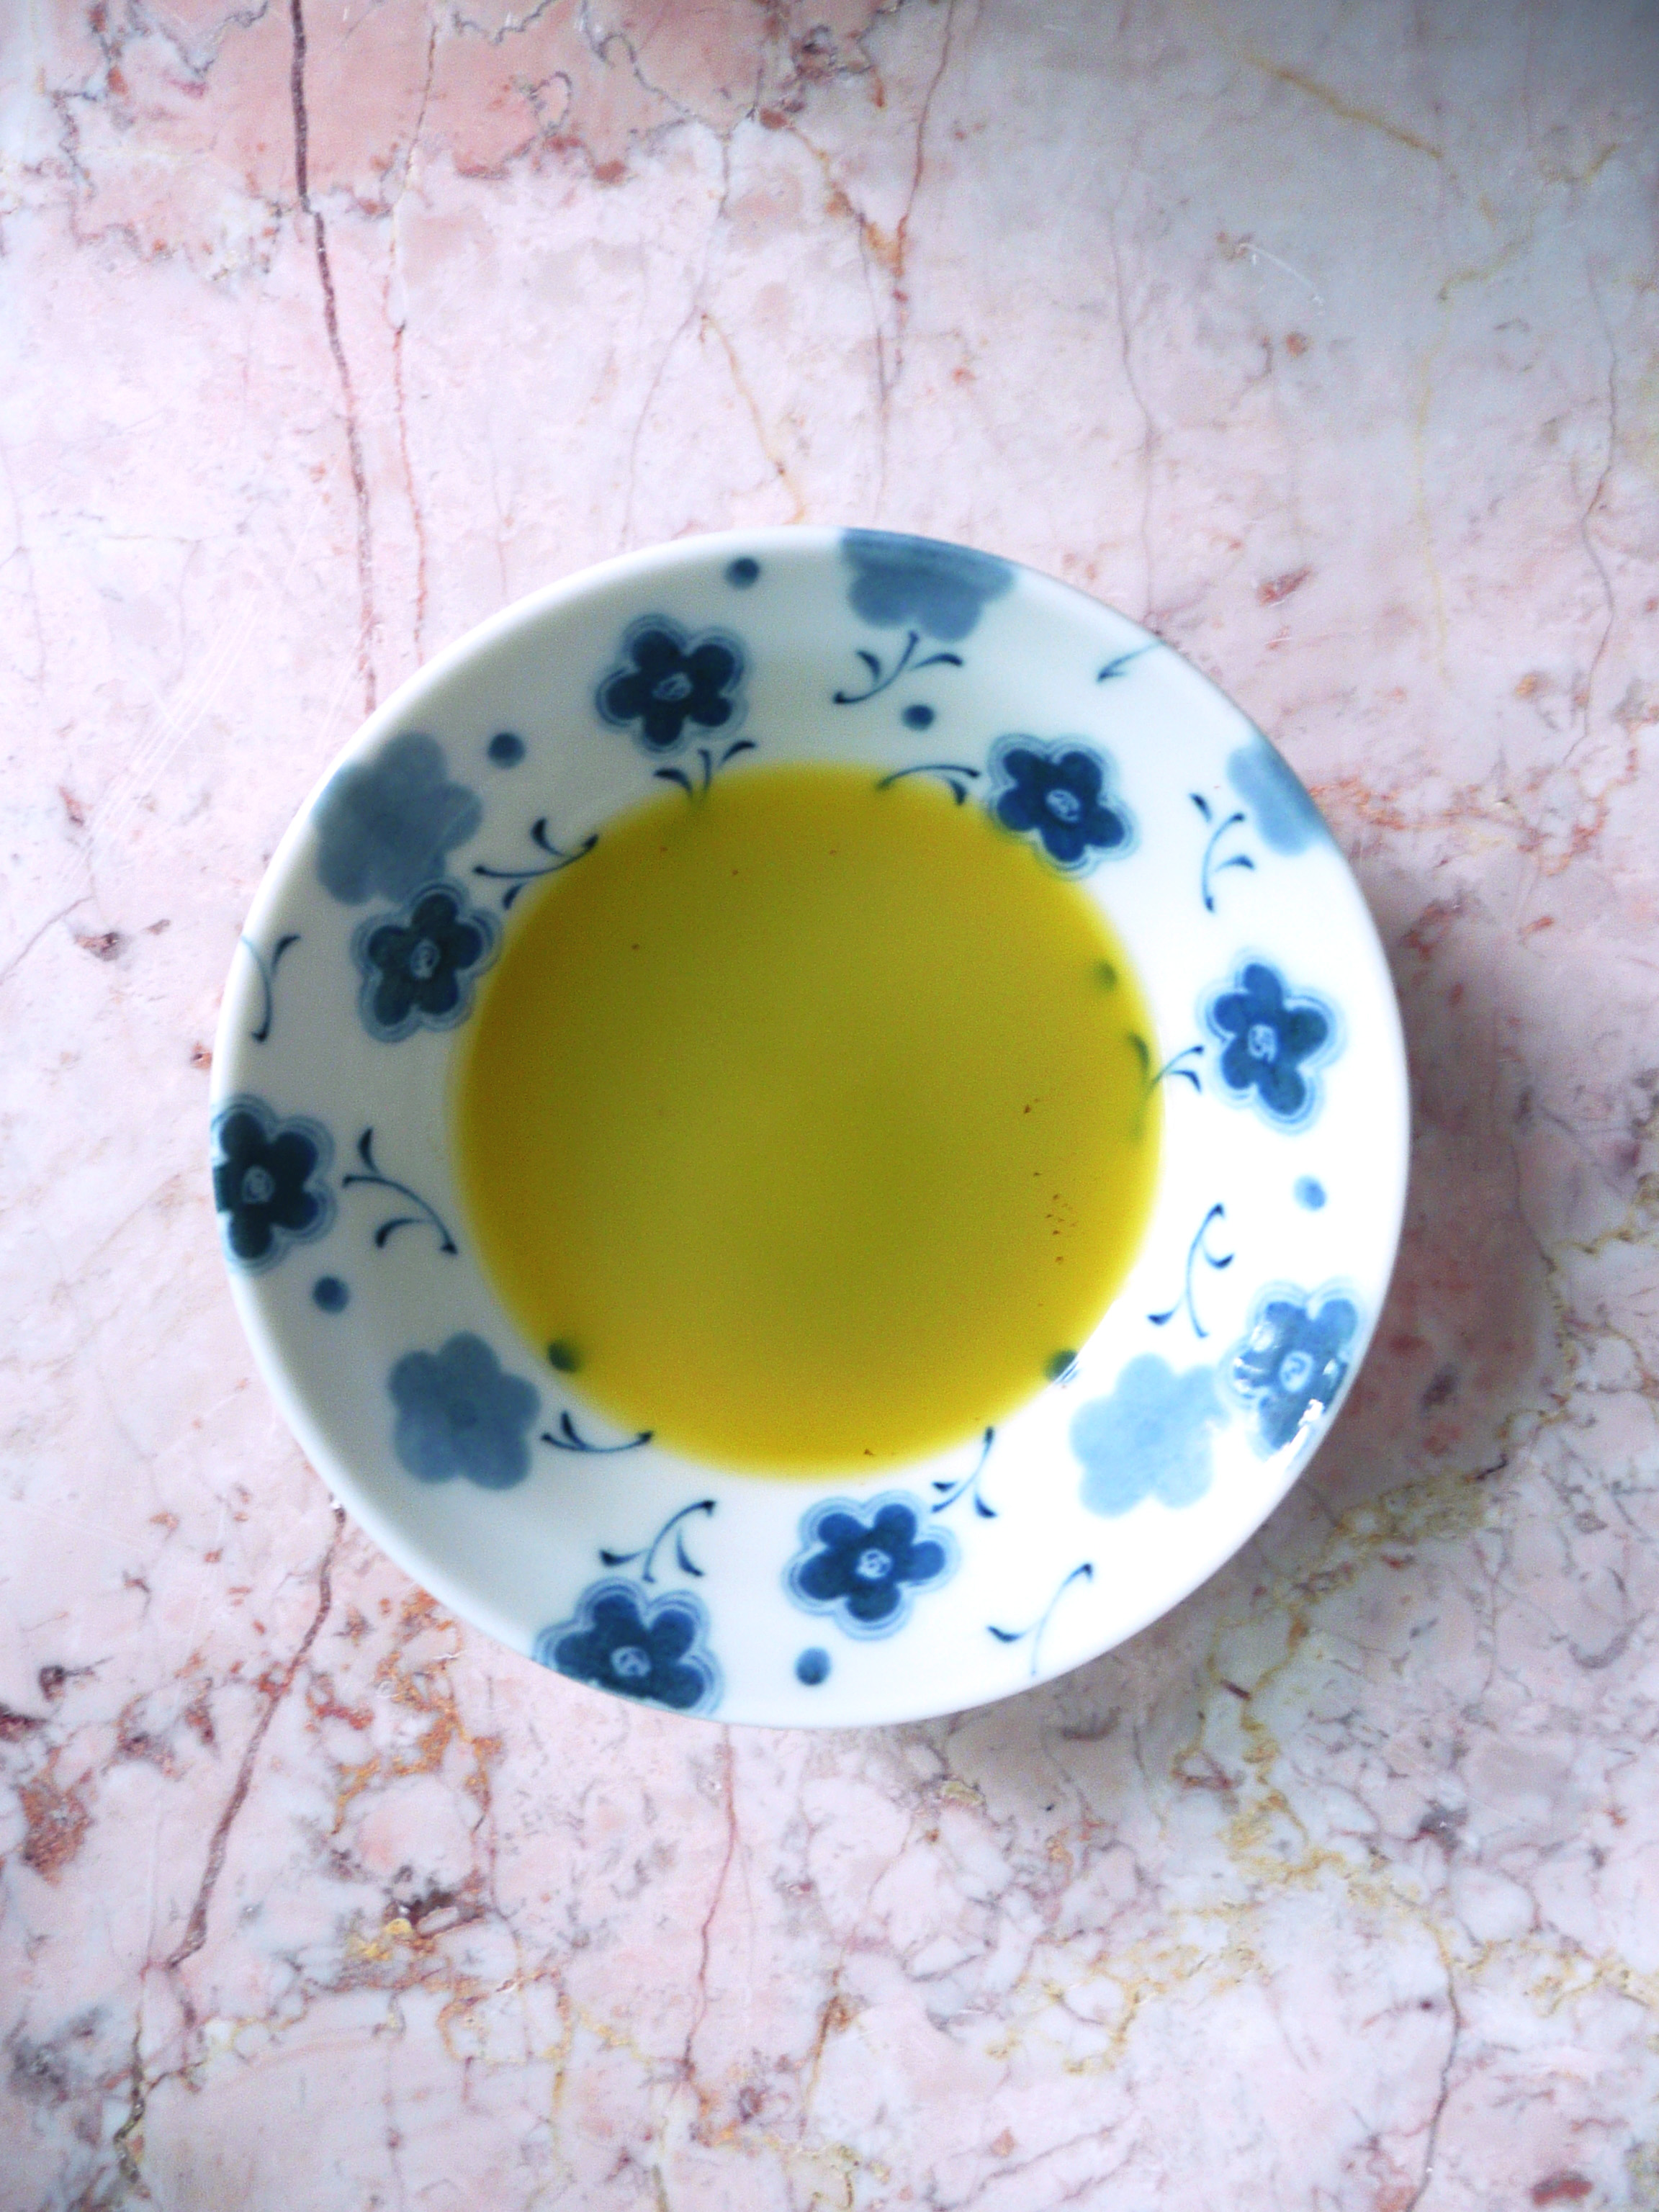 clove oil 2